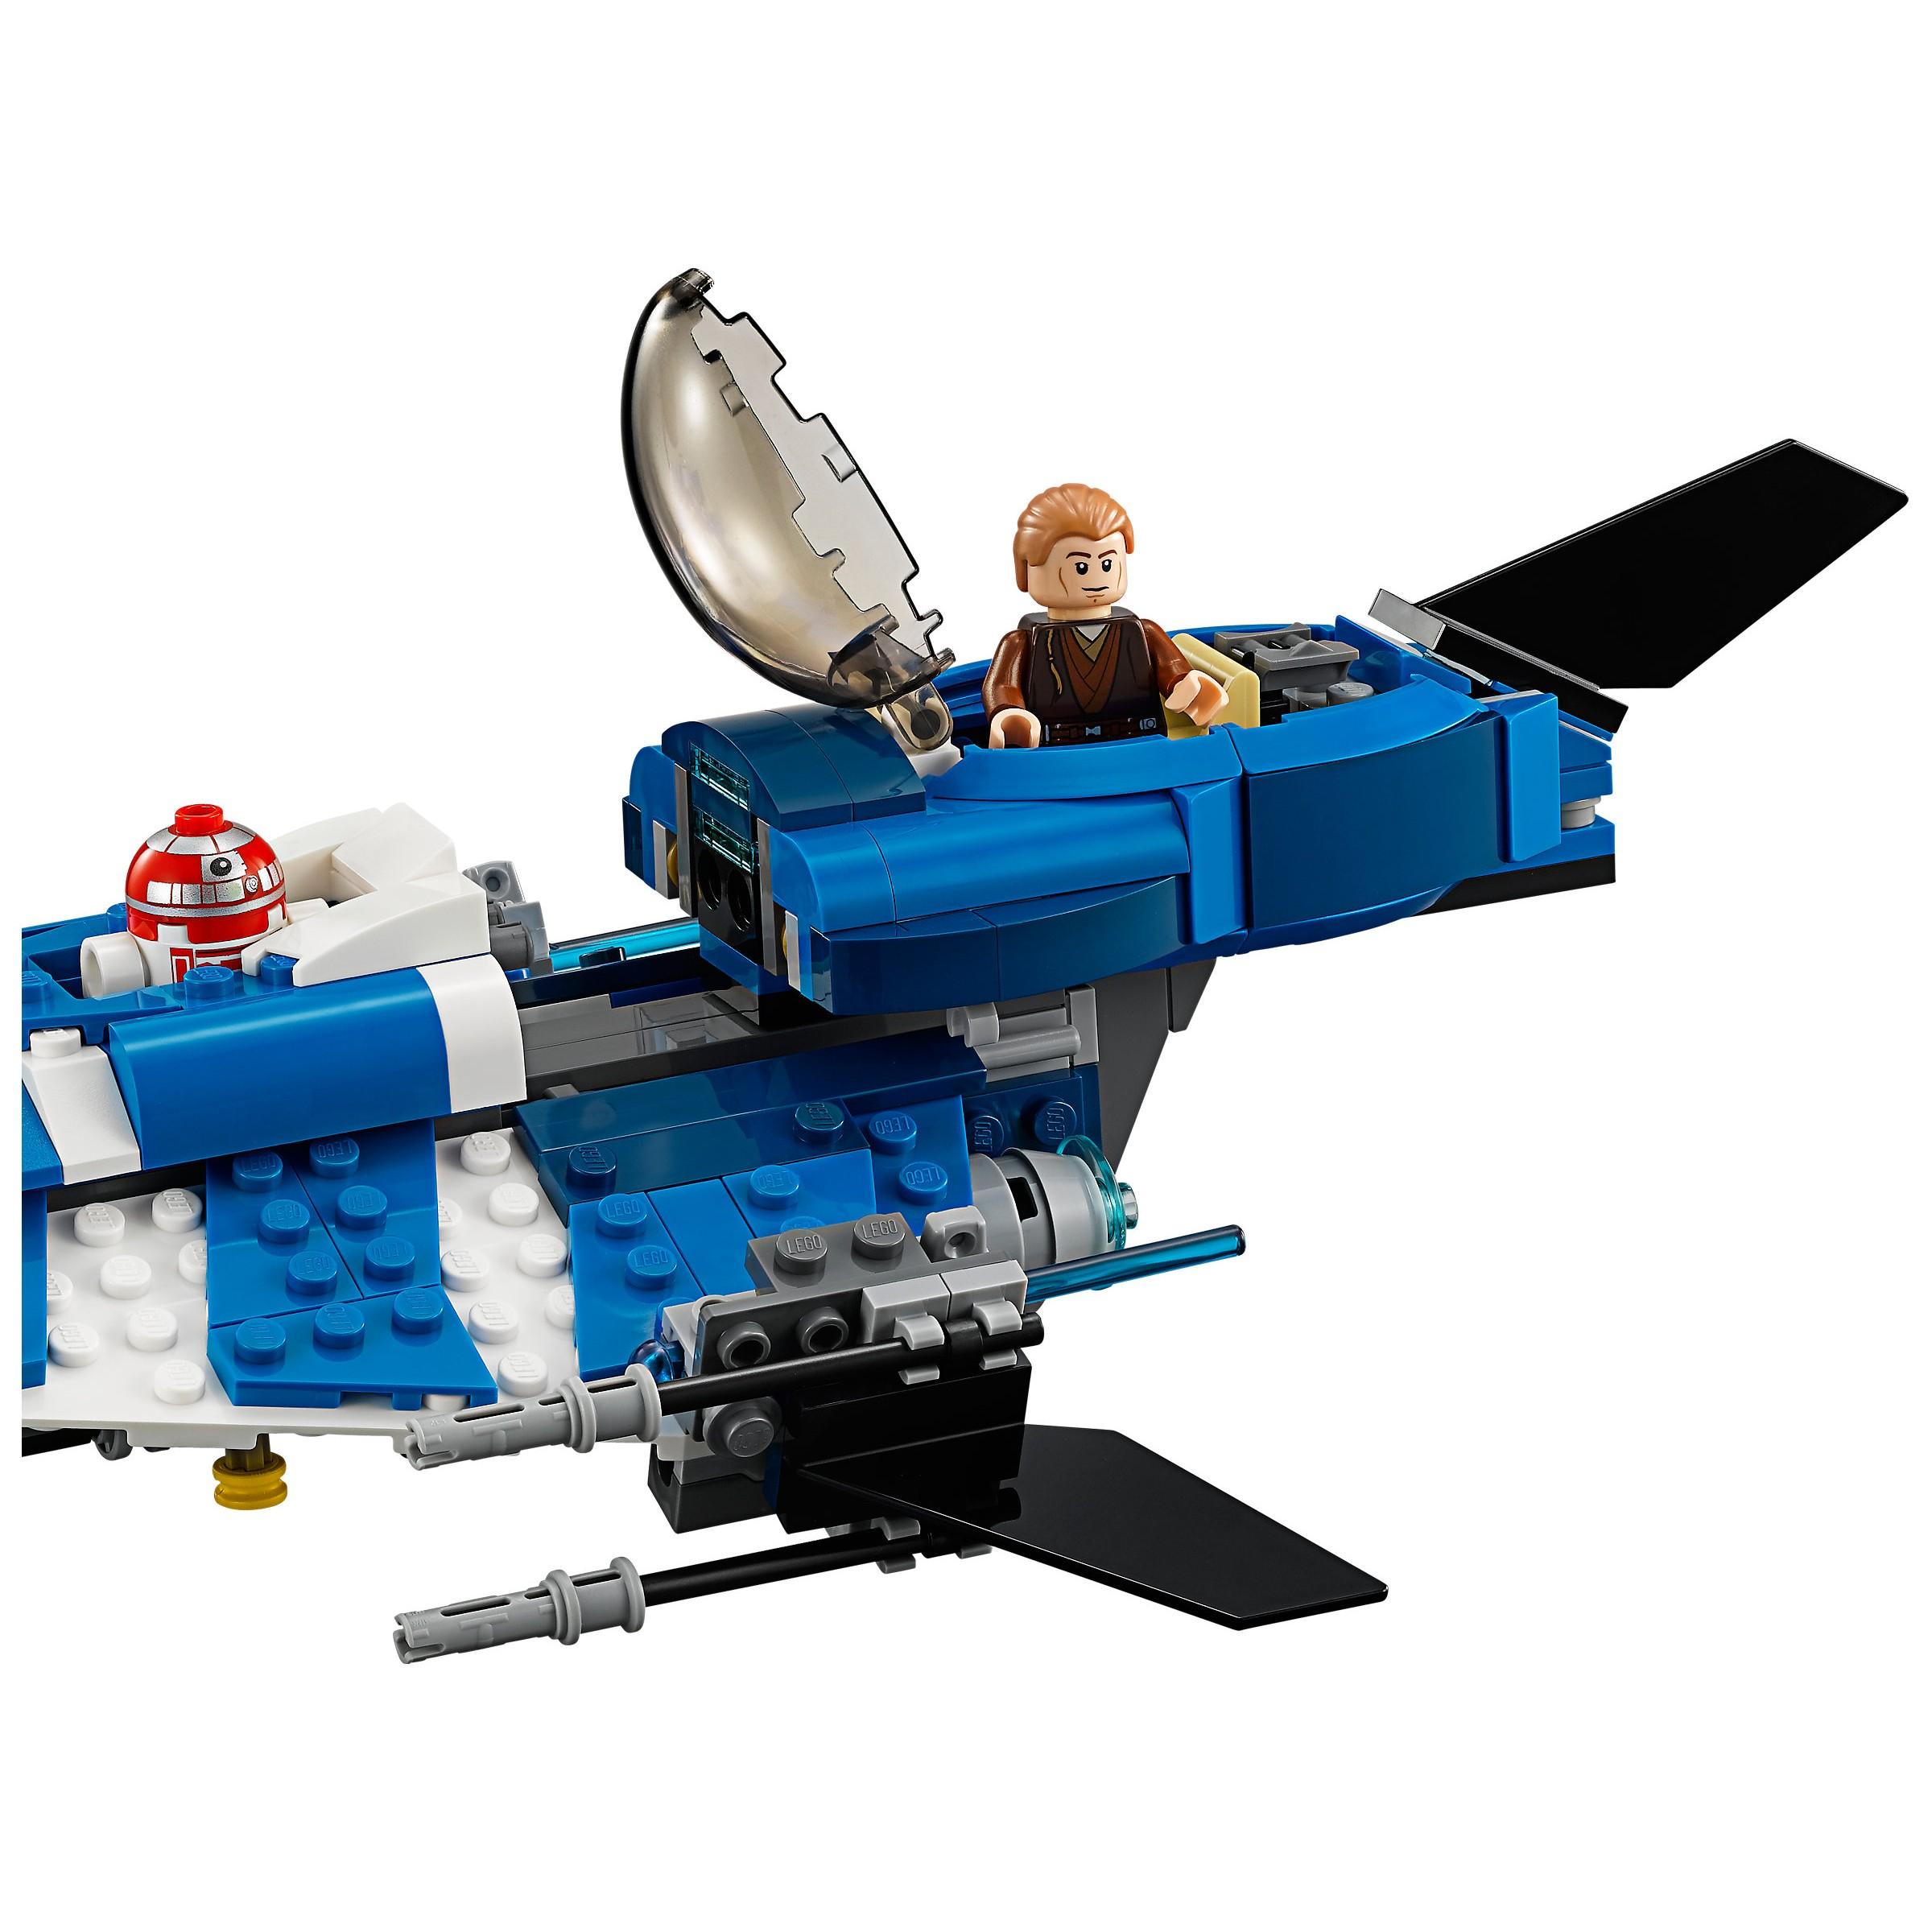 Lego 75087 star wars anakin 39 s custom jedi starfighter at - Lego star wars vaisseau anakin ...